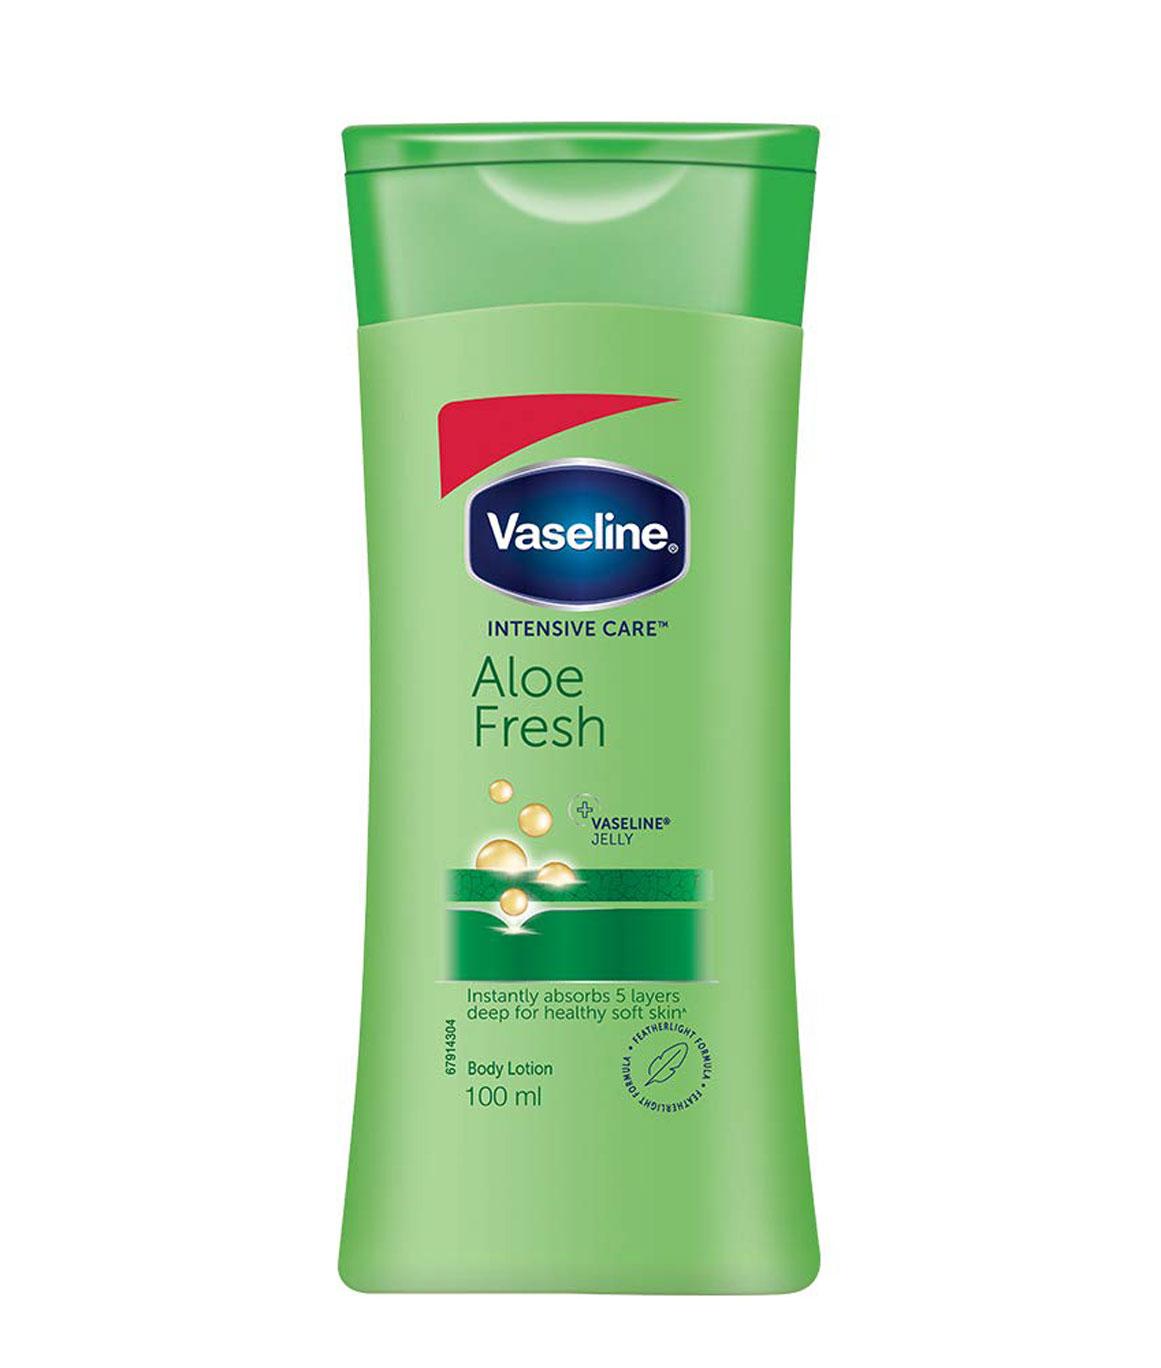 Vaseline Intensive Care Aloe Fresh Body Lotion, 100 ml